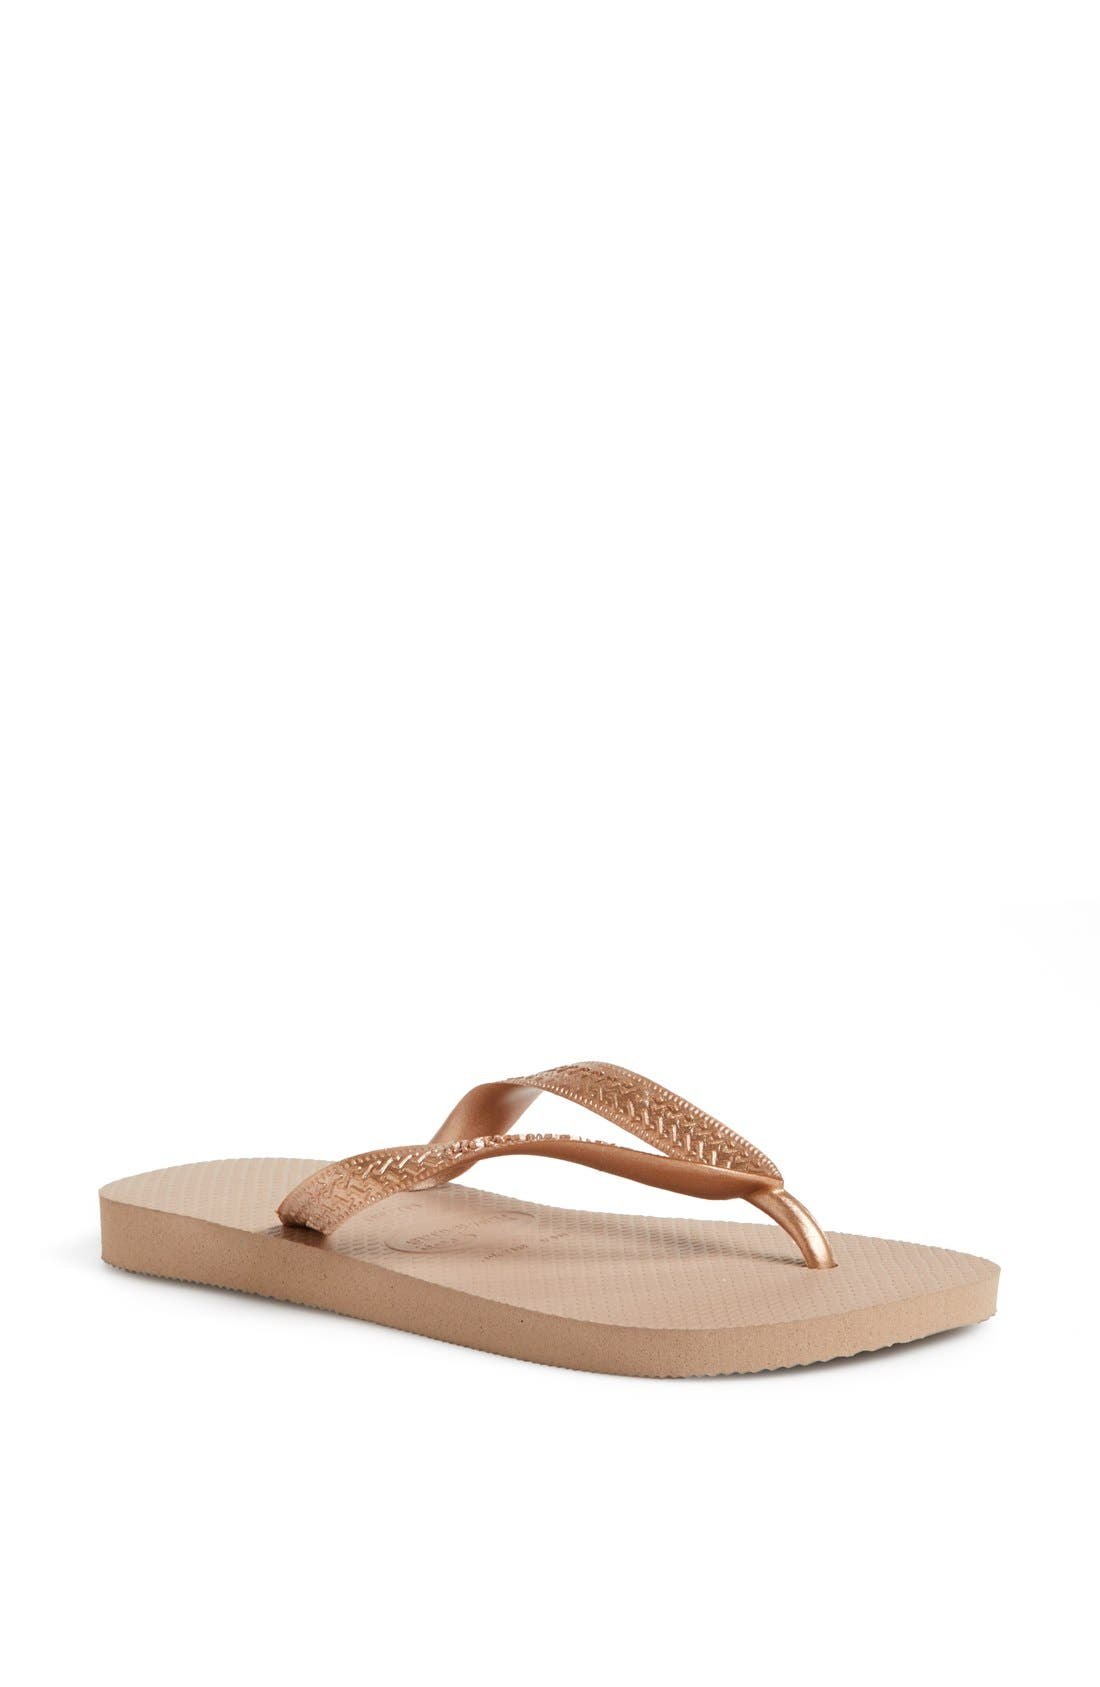 Alternate Image 1 Selected - Havaianas 'Metallic Top' Thong Sandal (Women)